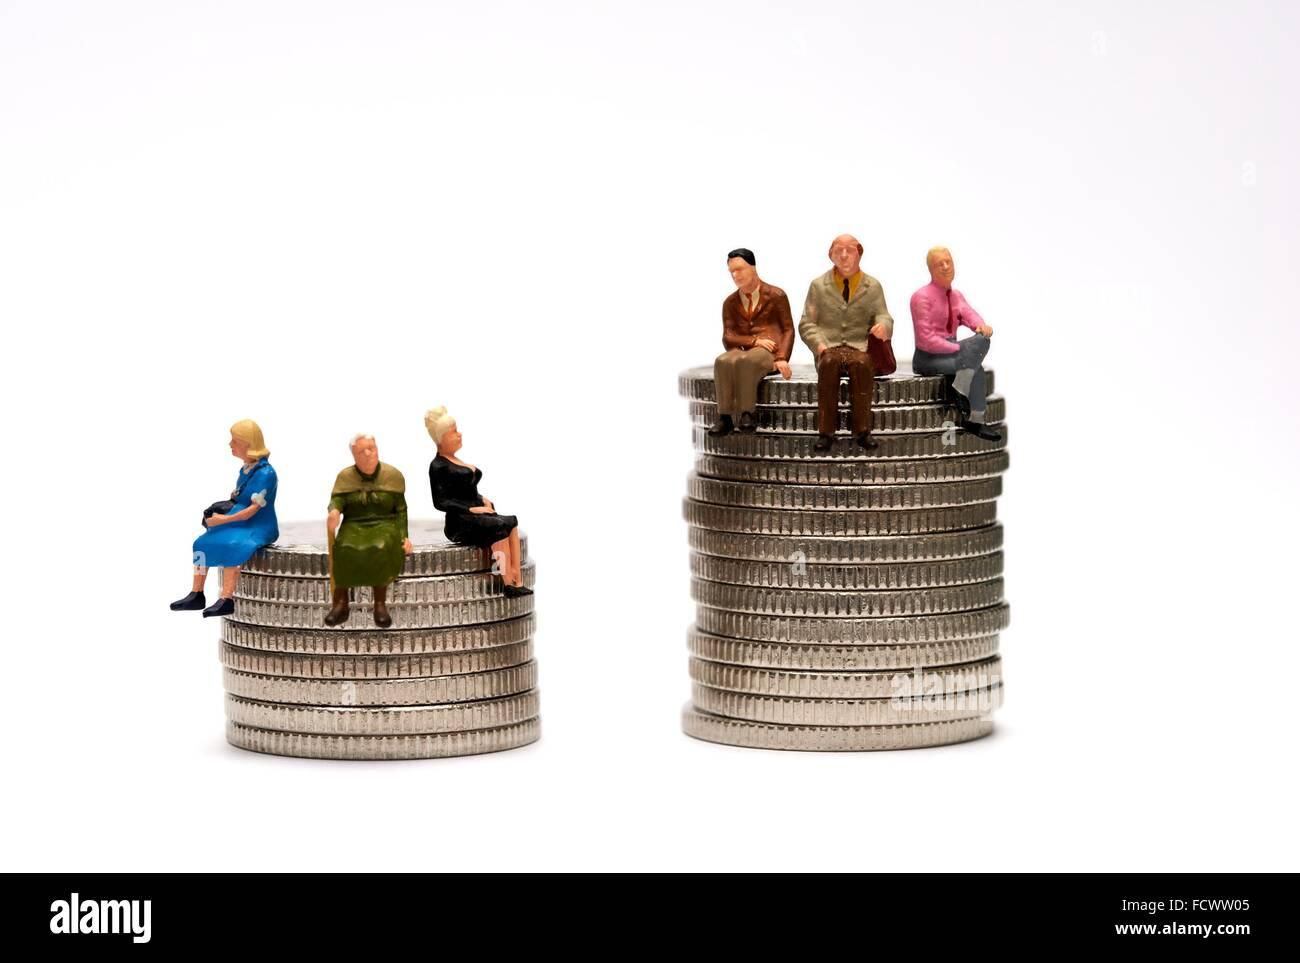 Pension gap concept - Stock Image